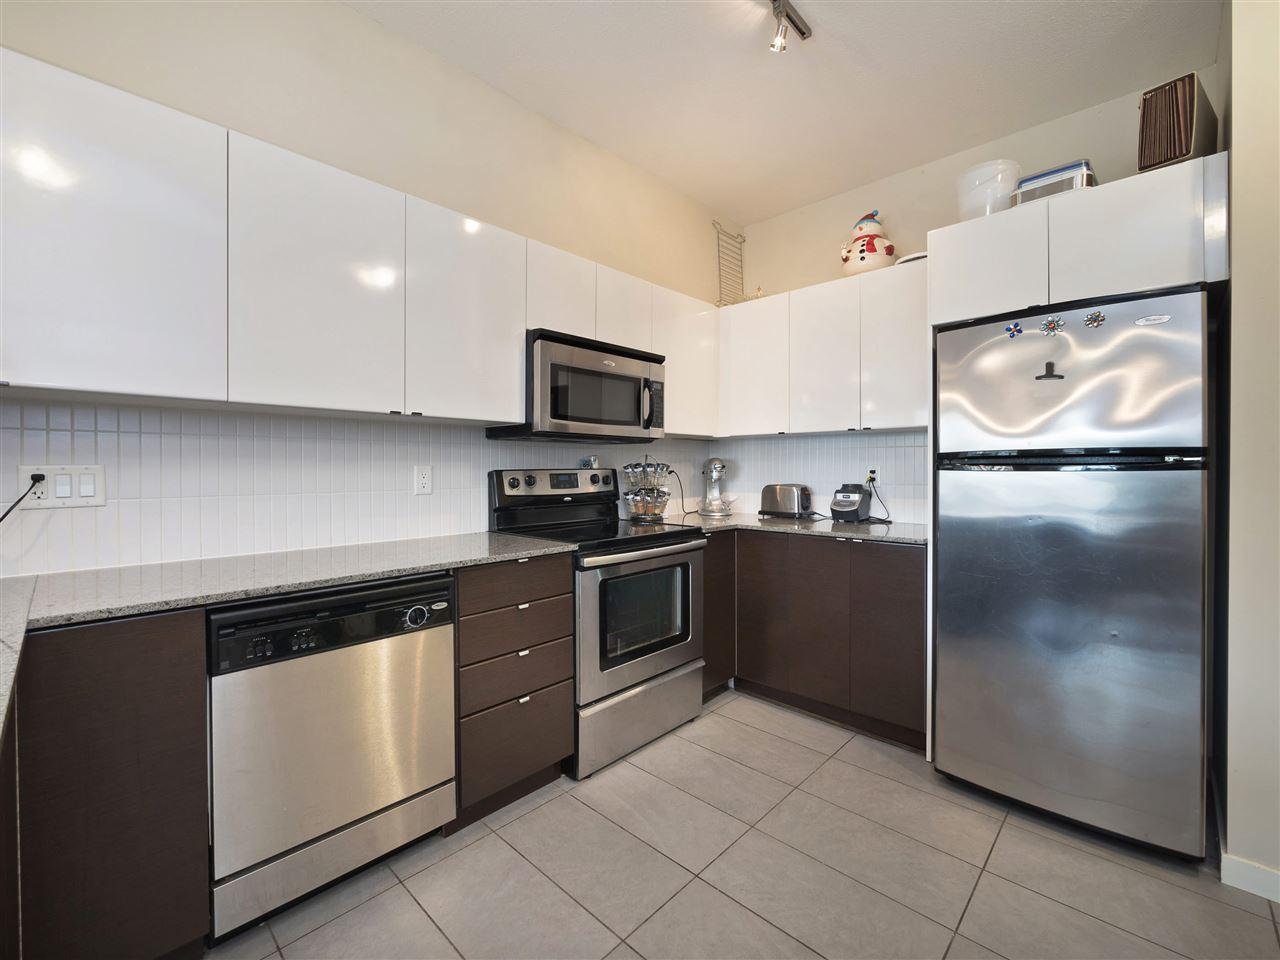 Condo Apartment at 332 13733 107A AVENUE, Unit 332, North Surrey, British Columbia. Image 3